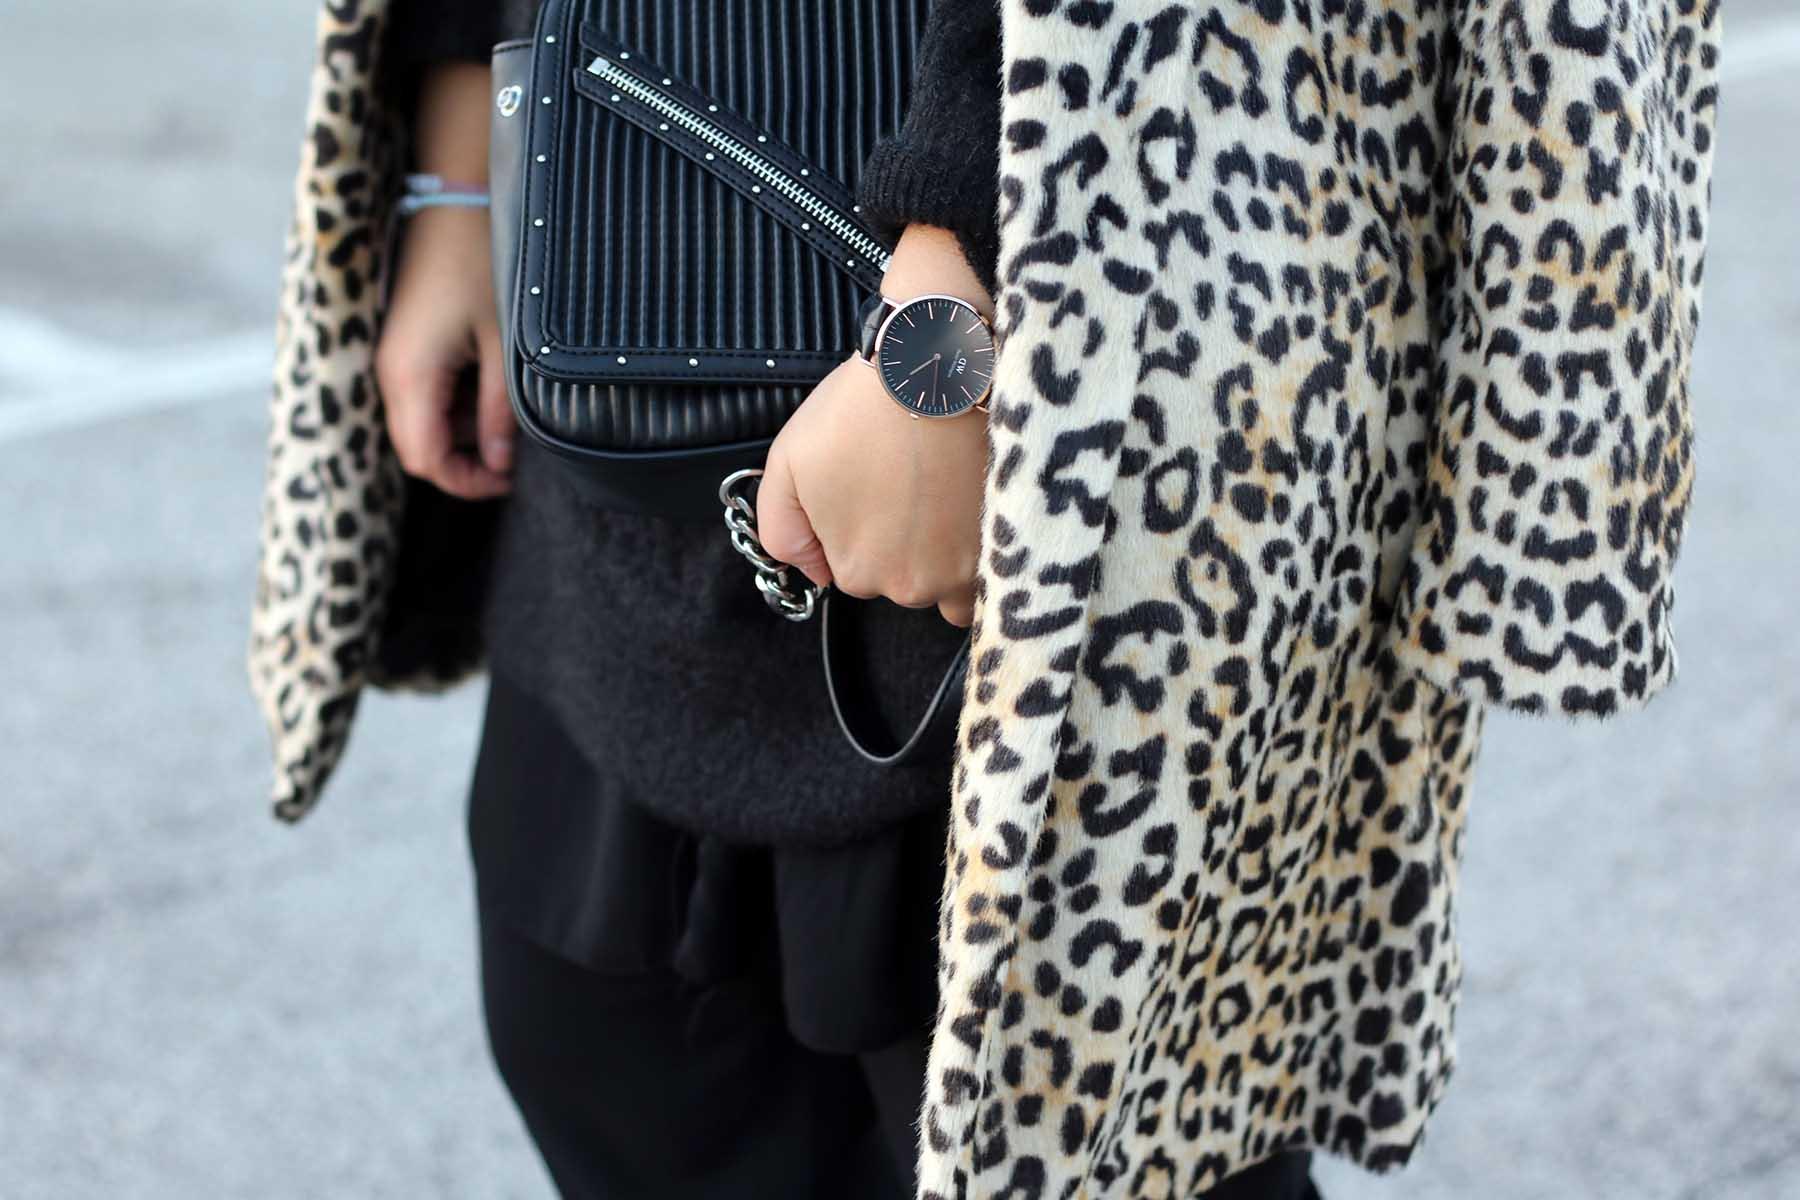 outift-leomantel-mantel-winter-leoparden-modeblog-fashionblog-look-braunschweig12